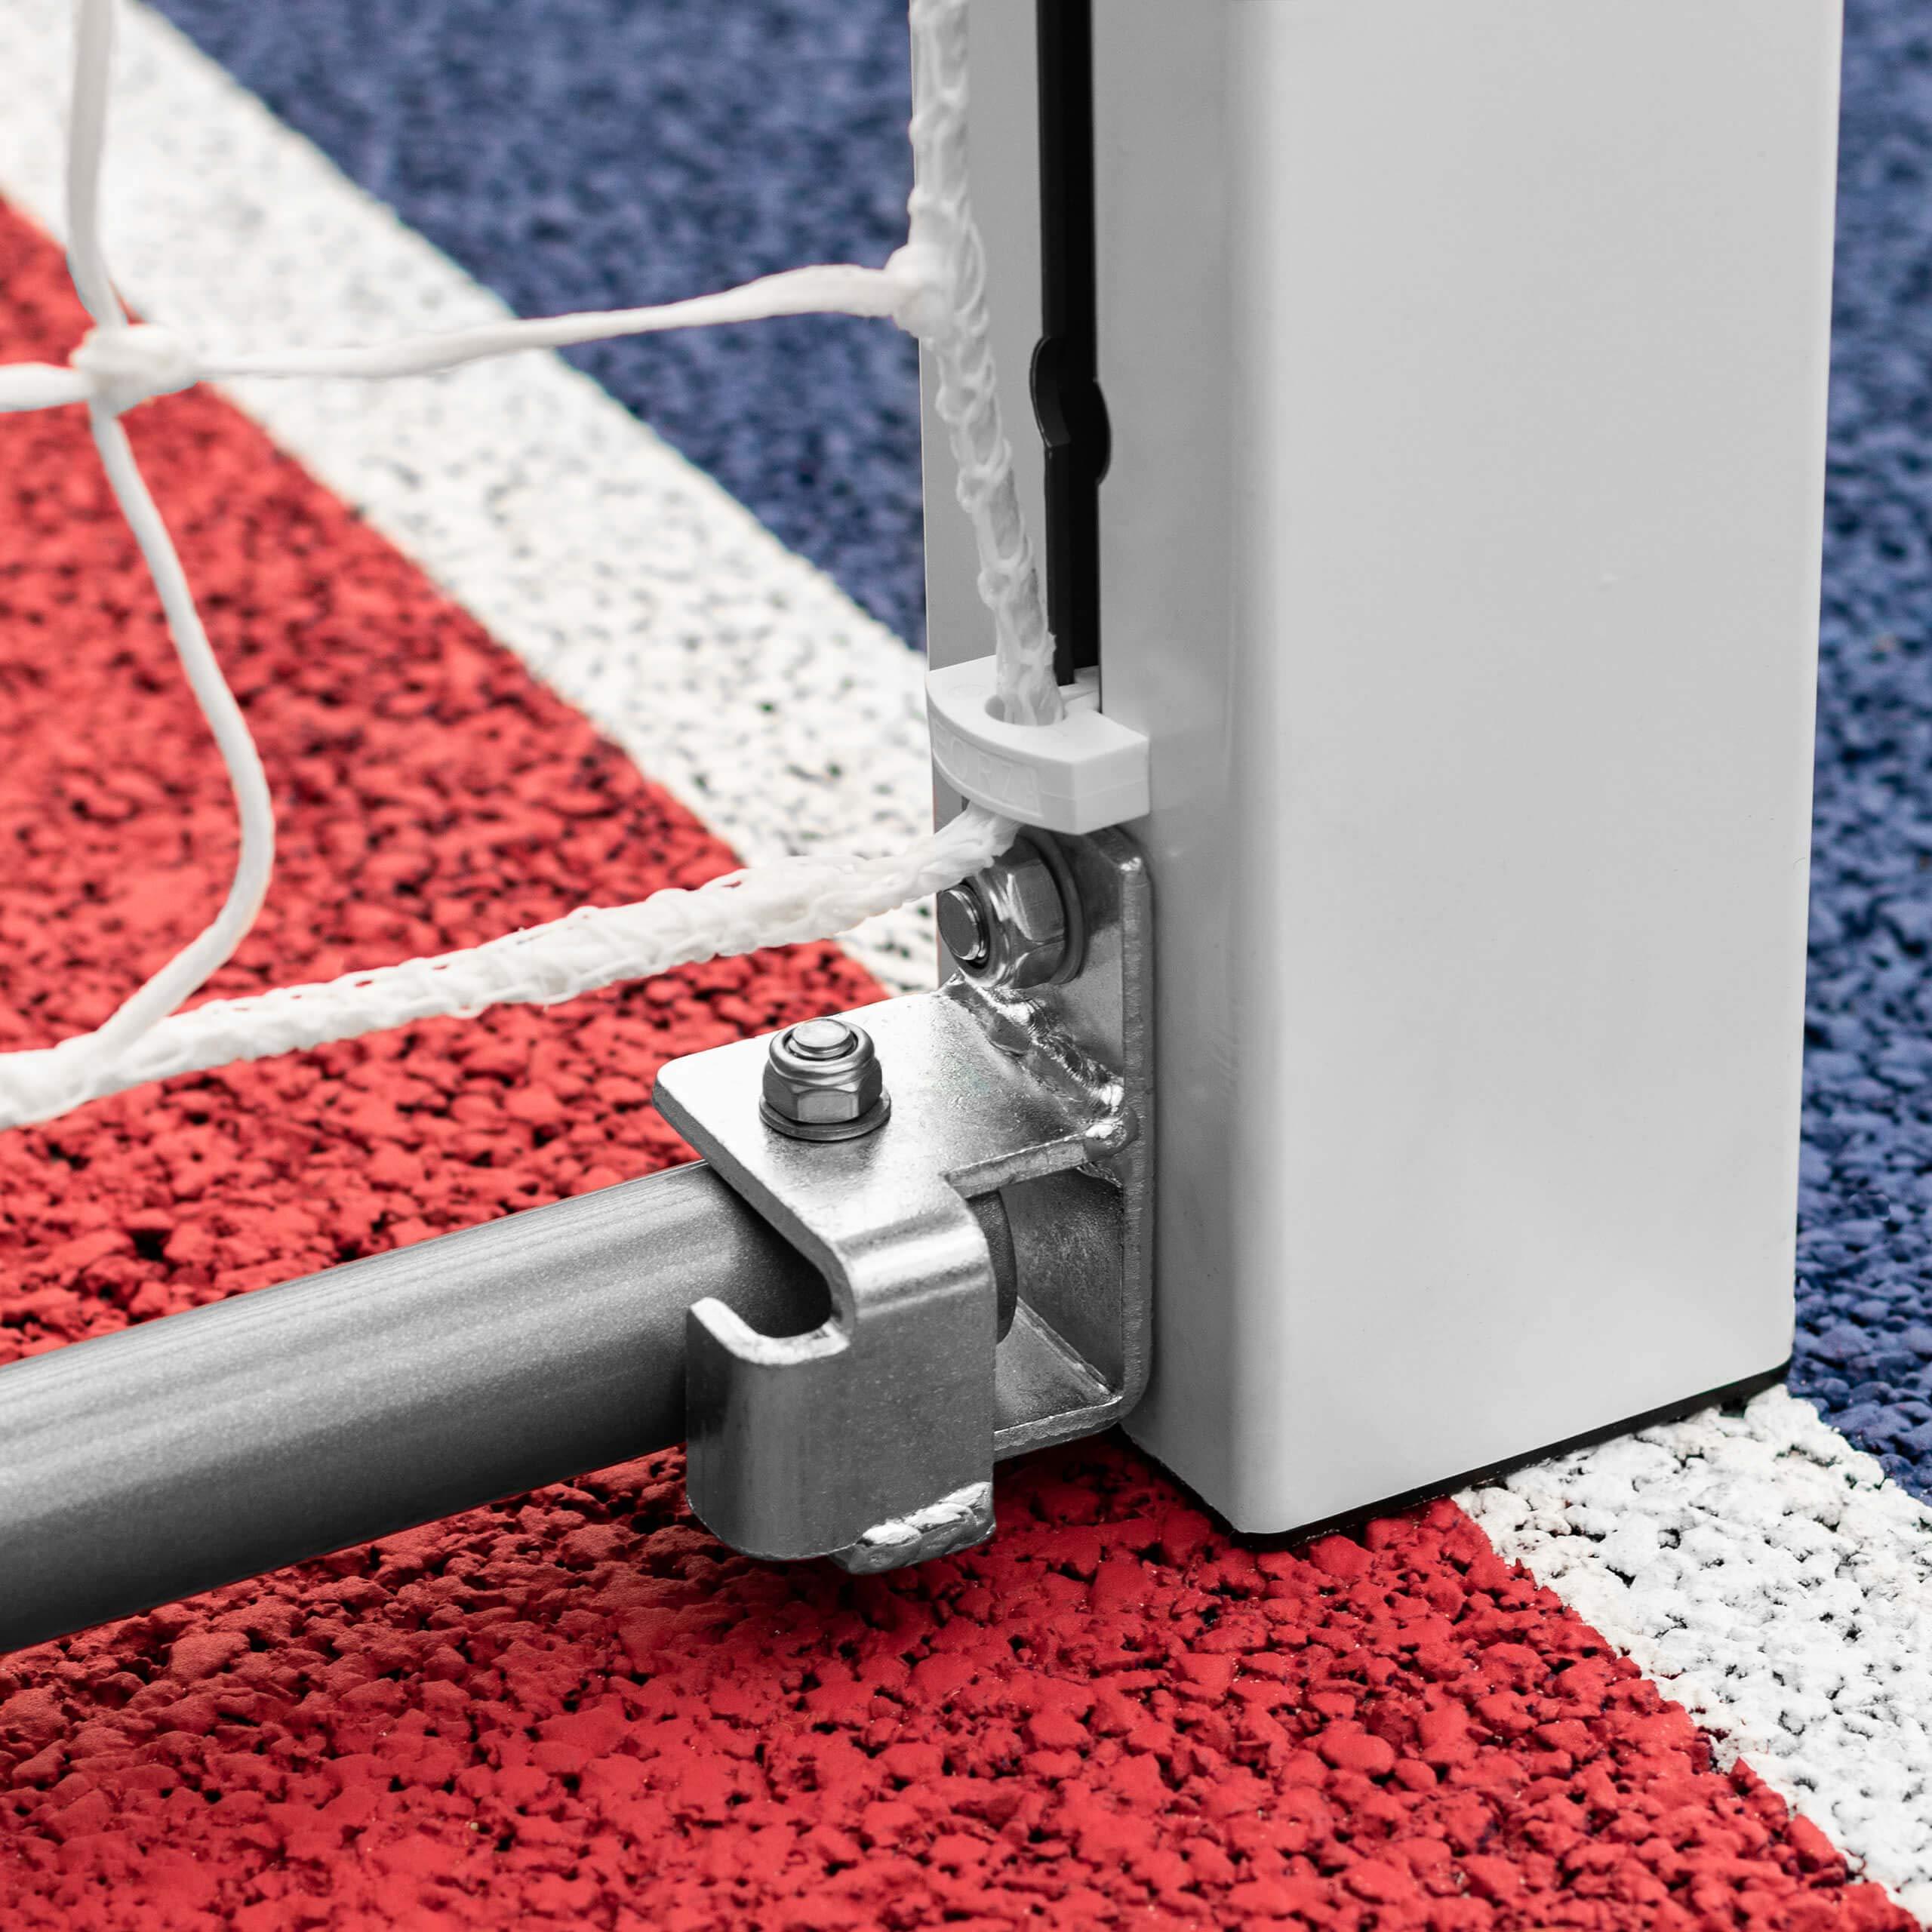 Forza Alu80 Competition Handball Goals | IHF Regulation Size 3m x 2m Handball Goal [Net World Sports] (Pair, Red) by Forza (Image #7)